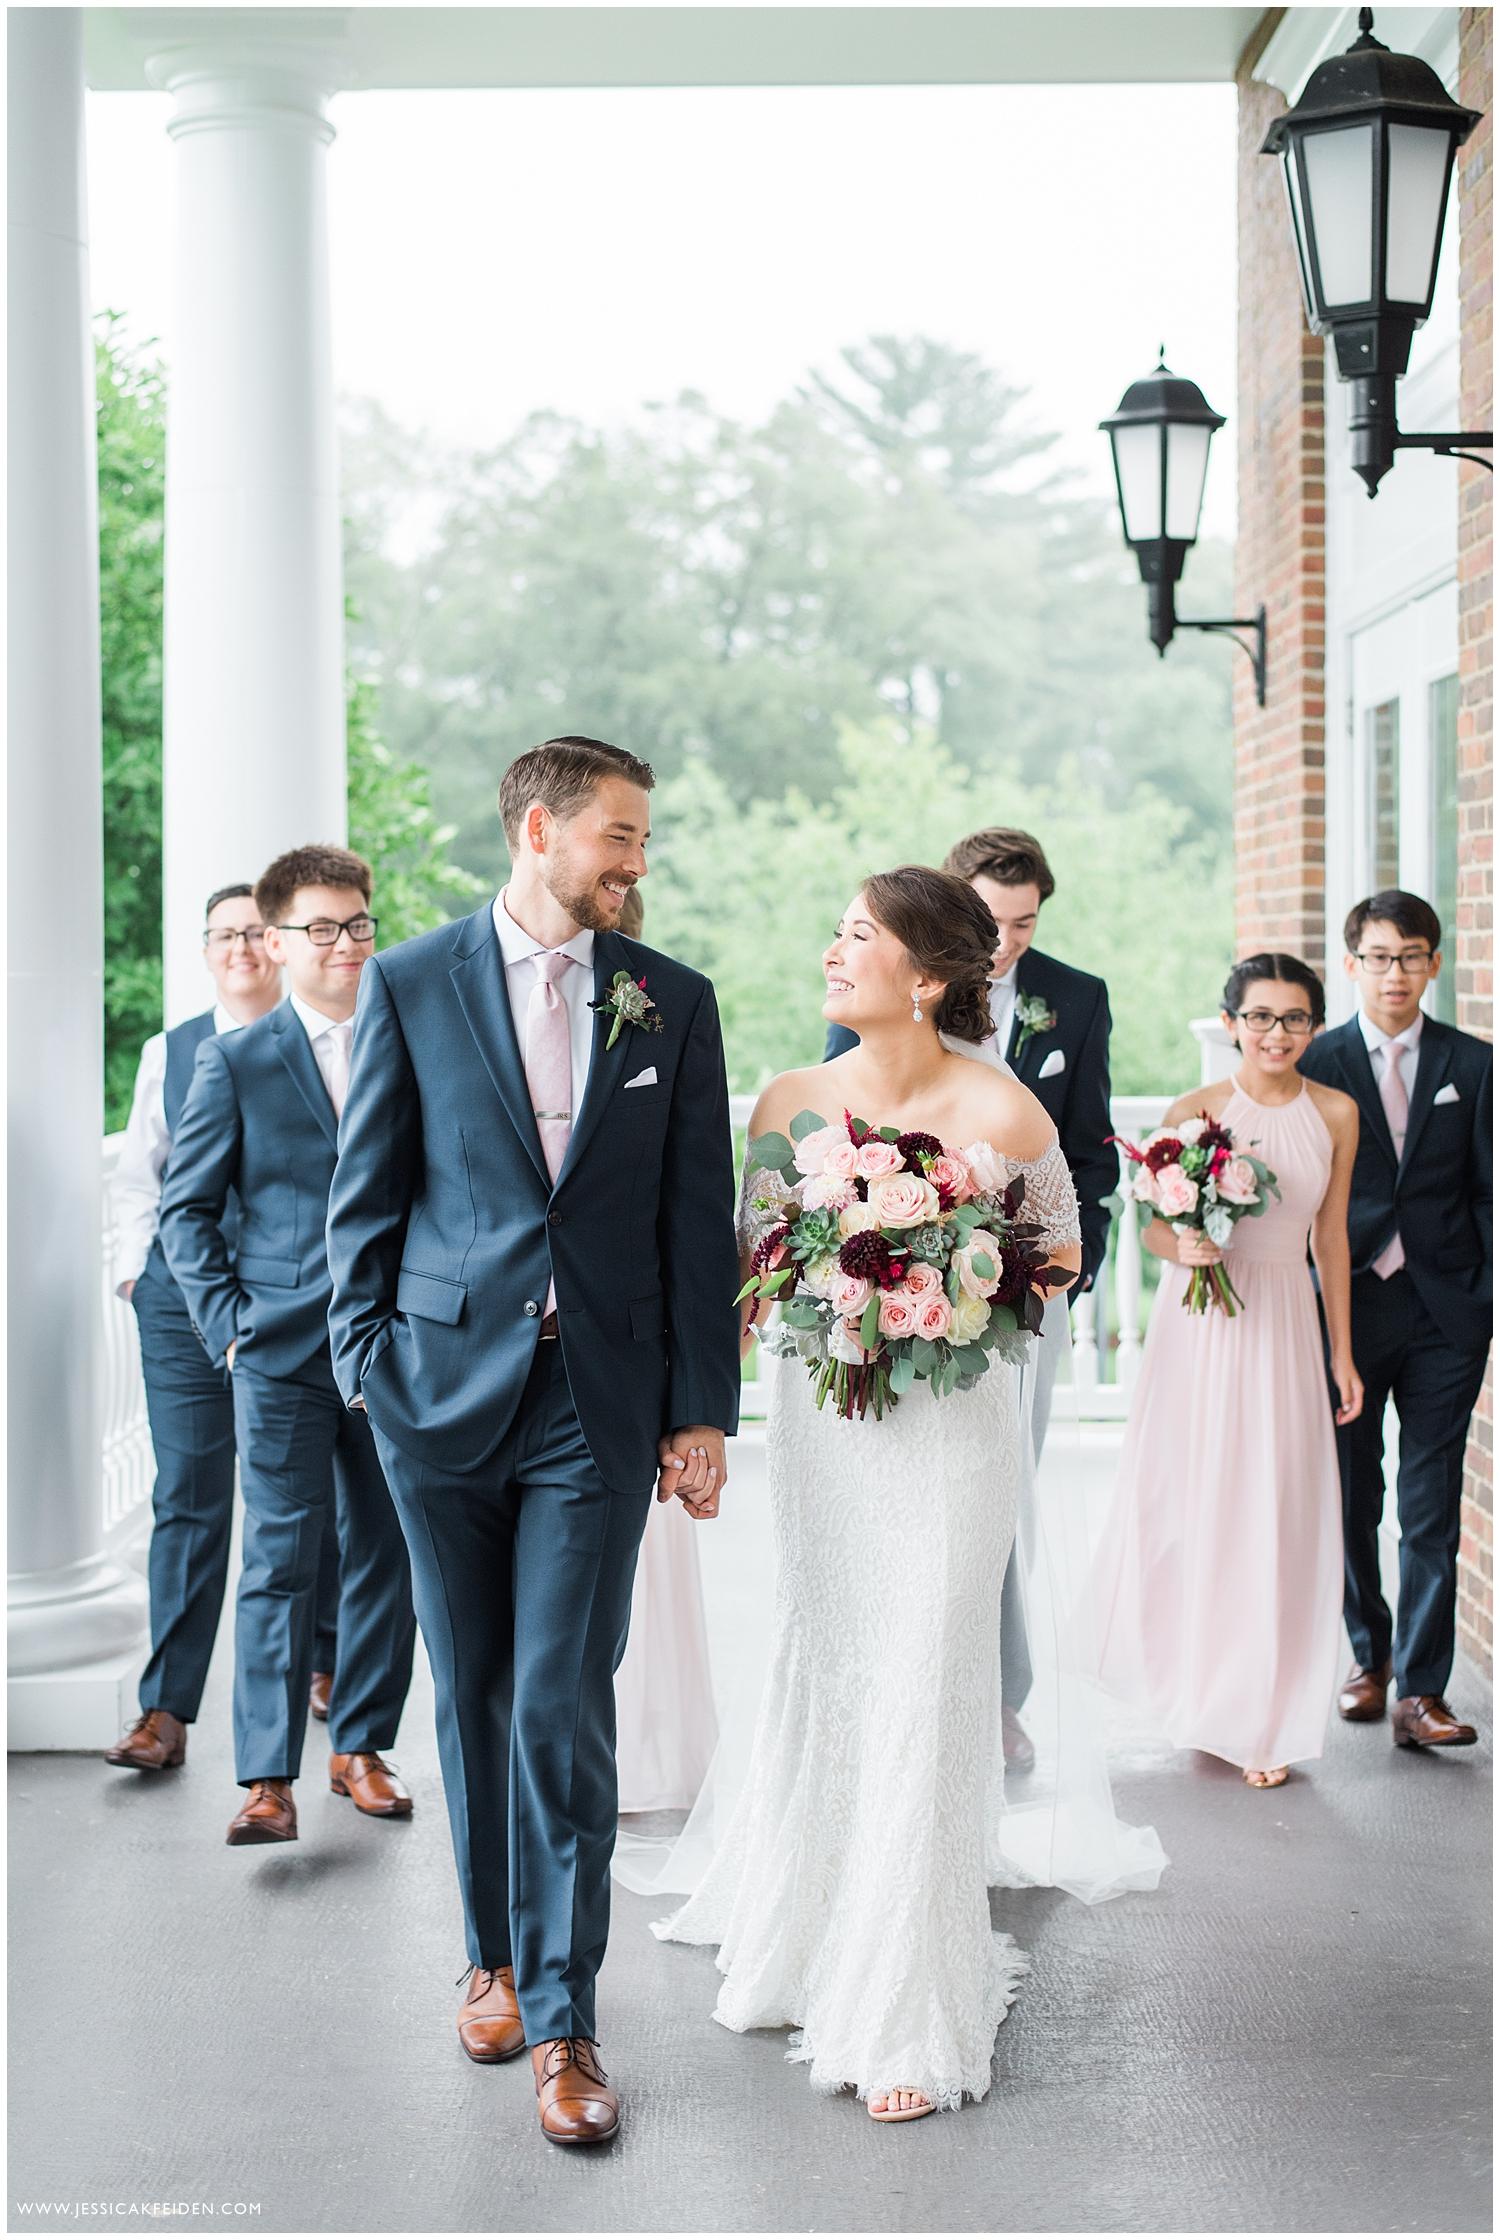 Jessica K Feiden Photography_Charter Oak Country Club Wedding_0024.jpg